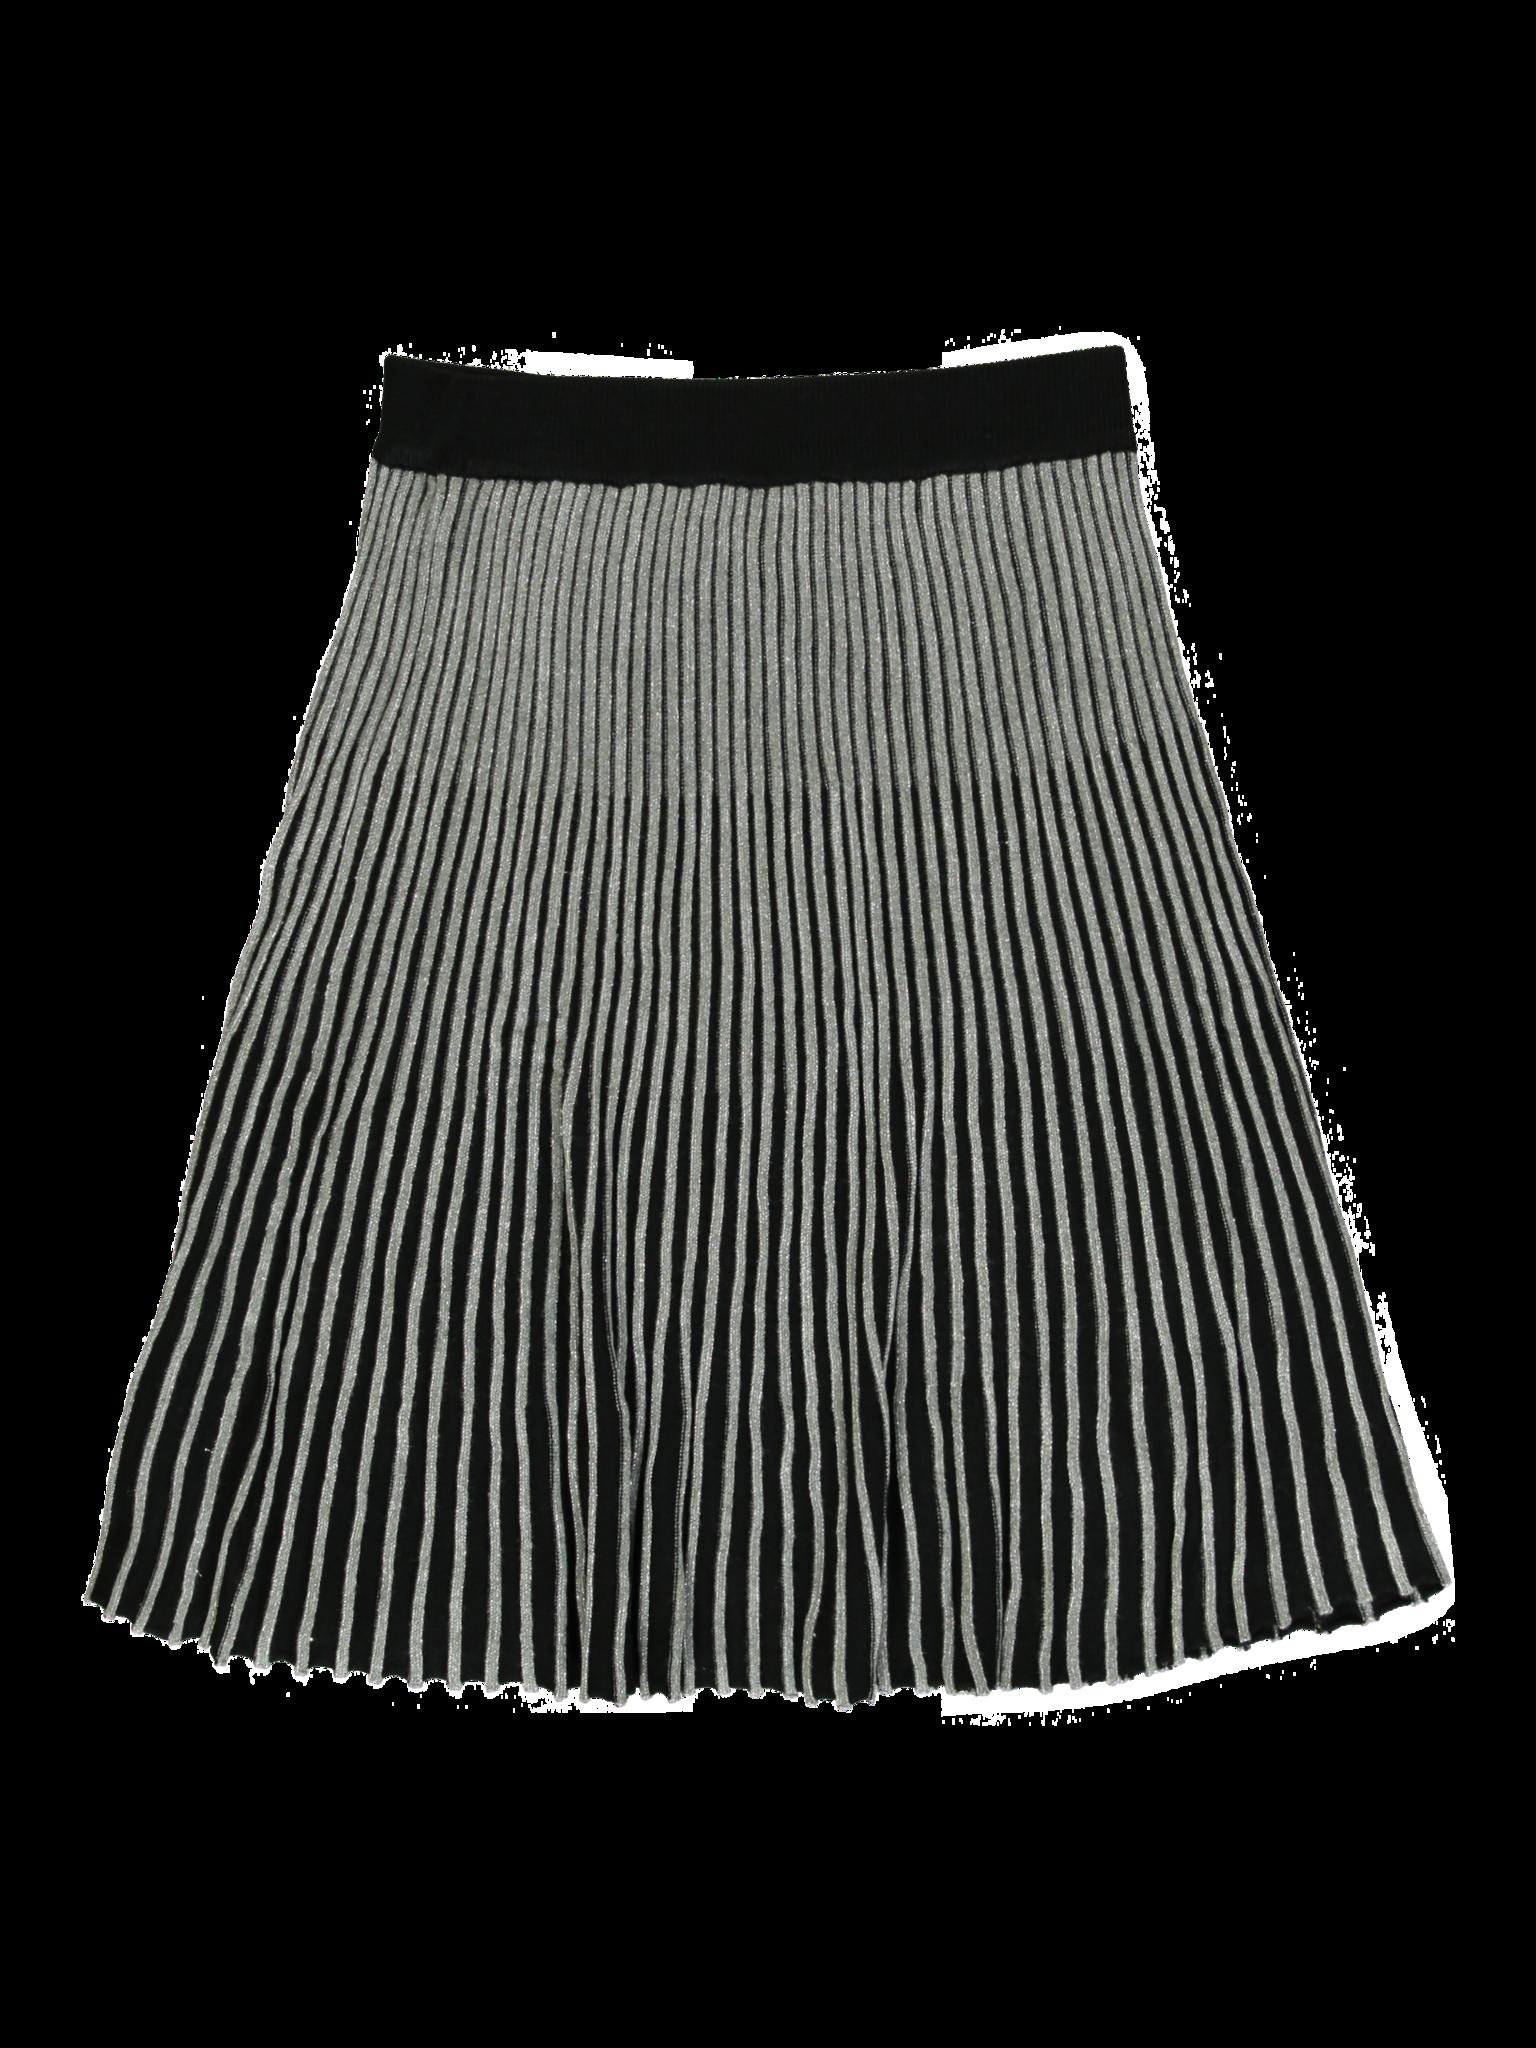 All Brands | Winterproducts Ladies | Skirt | 18 pcs/box